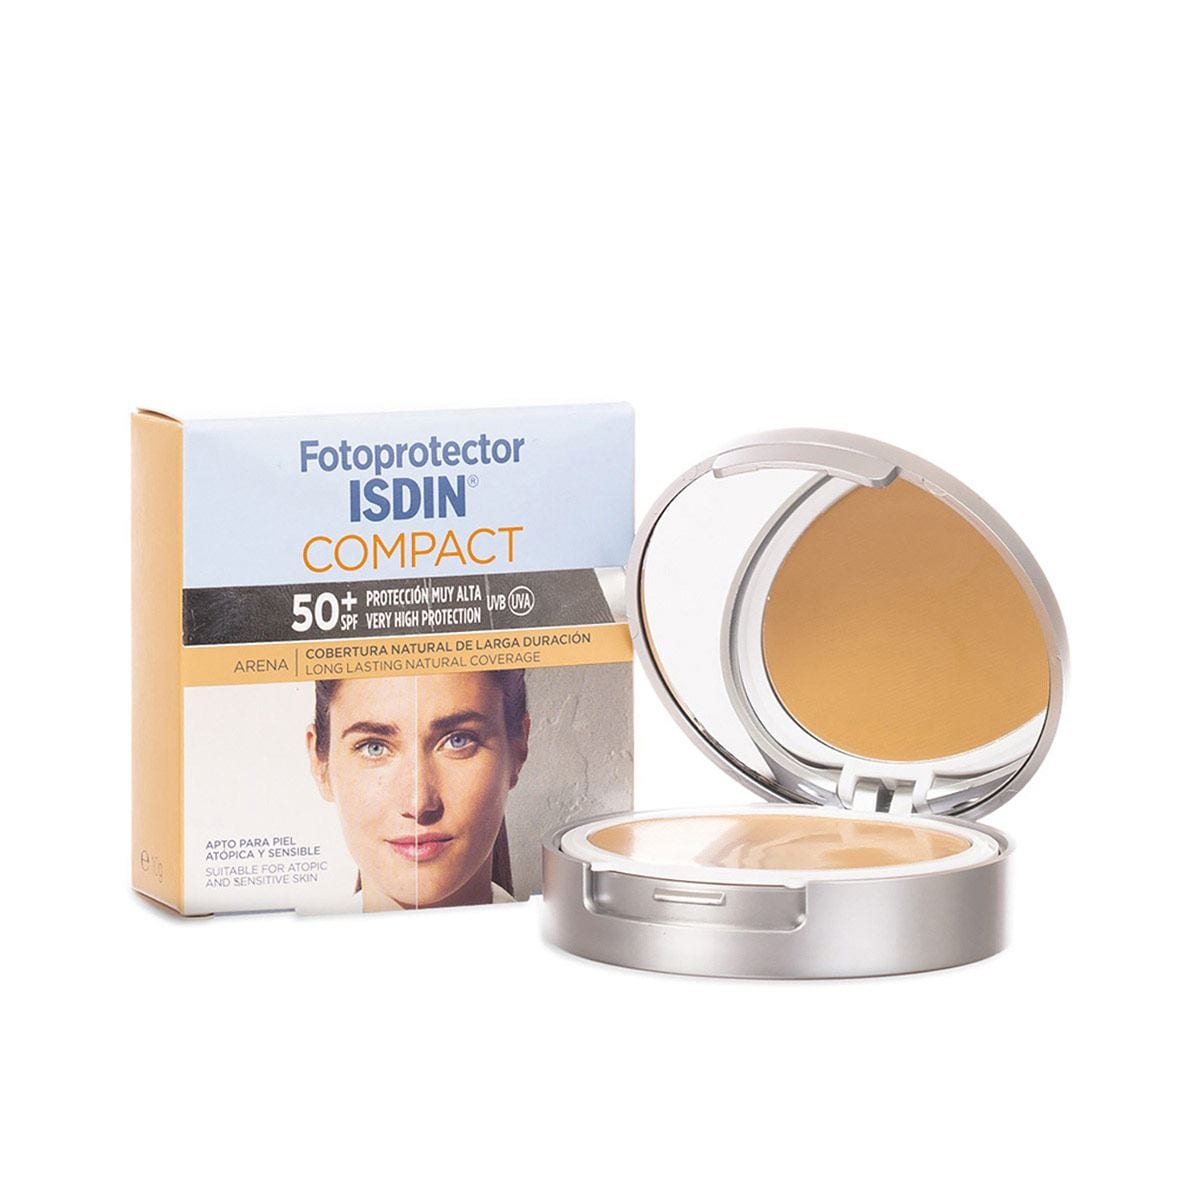 Fotoprotector  50+ Maquillaje Compacto Color Arena Isdin